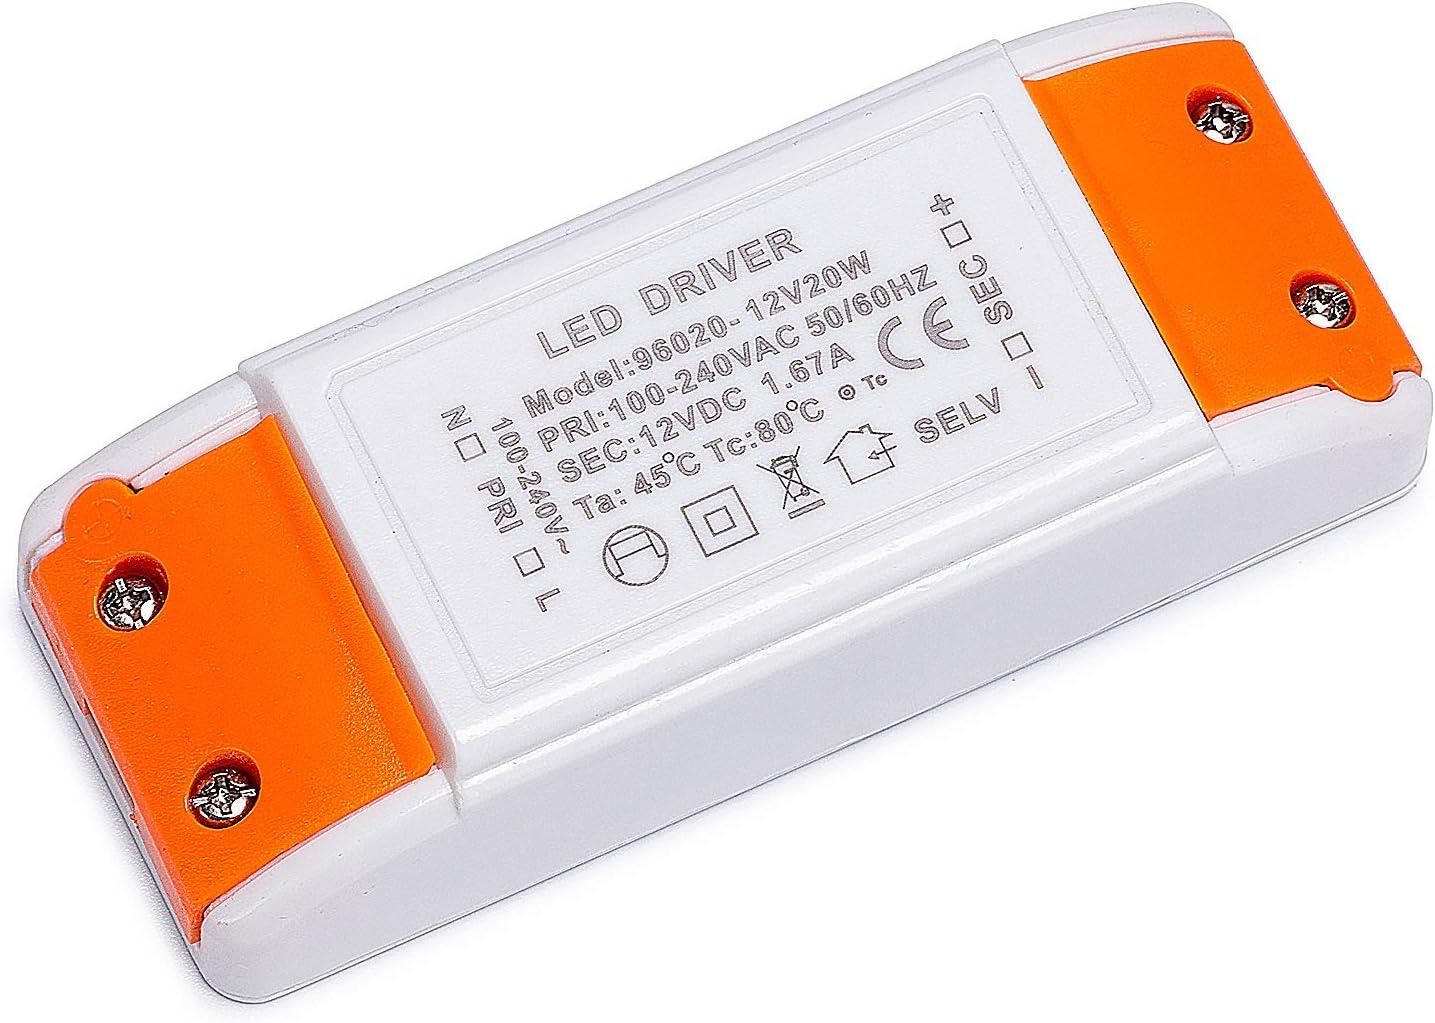 Yafido LED Transformador 220V (AC) a 12V (DC) Trafo 20W 1,67A LED Driver Fuente de Alimentación para Bajo Voltaje Bombillas G4 MR16 GU5.3 MR11 Tira LED